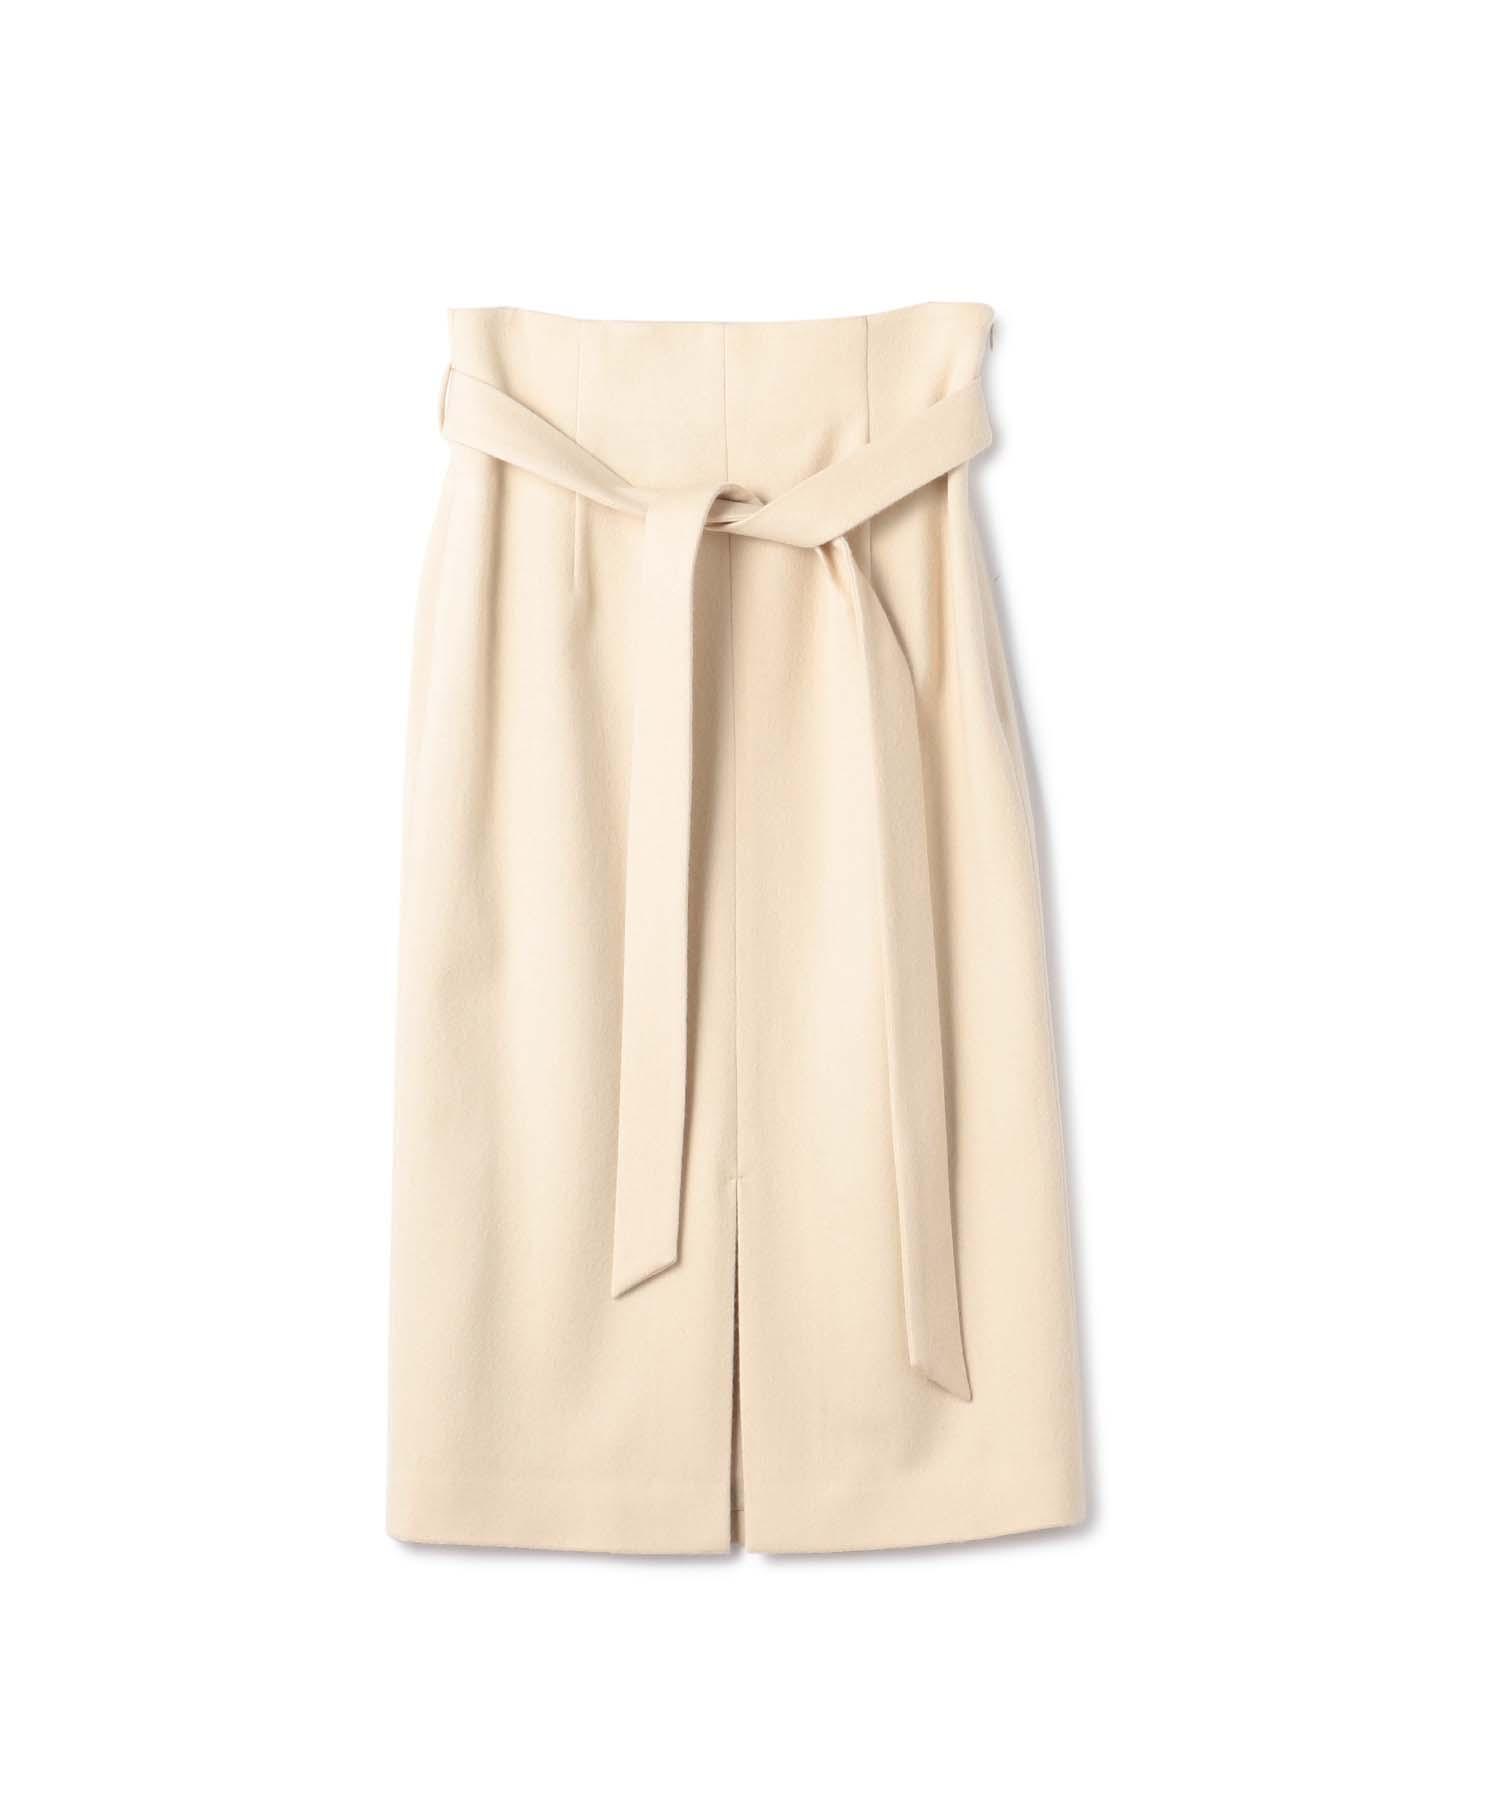 ESTNATION ウエストリボンスリットタイトスカート